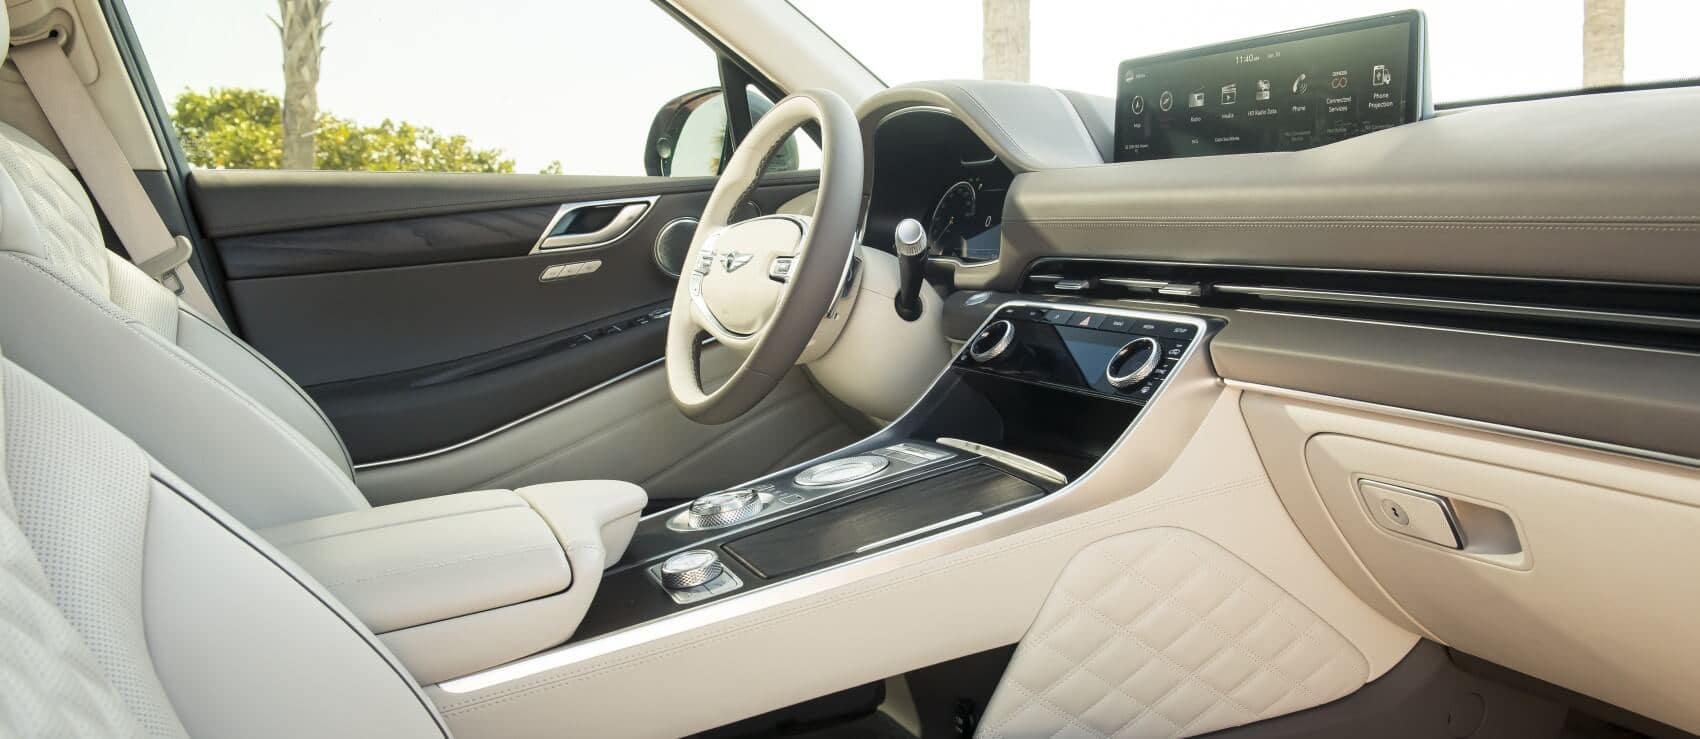 Genesis GV80 vs Acura MDX Interior